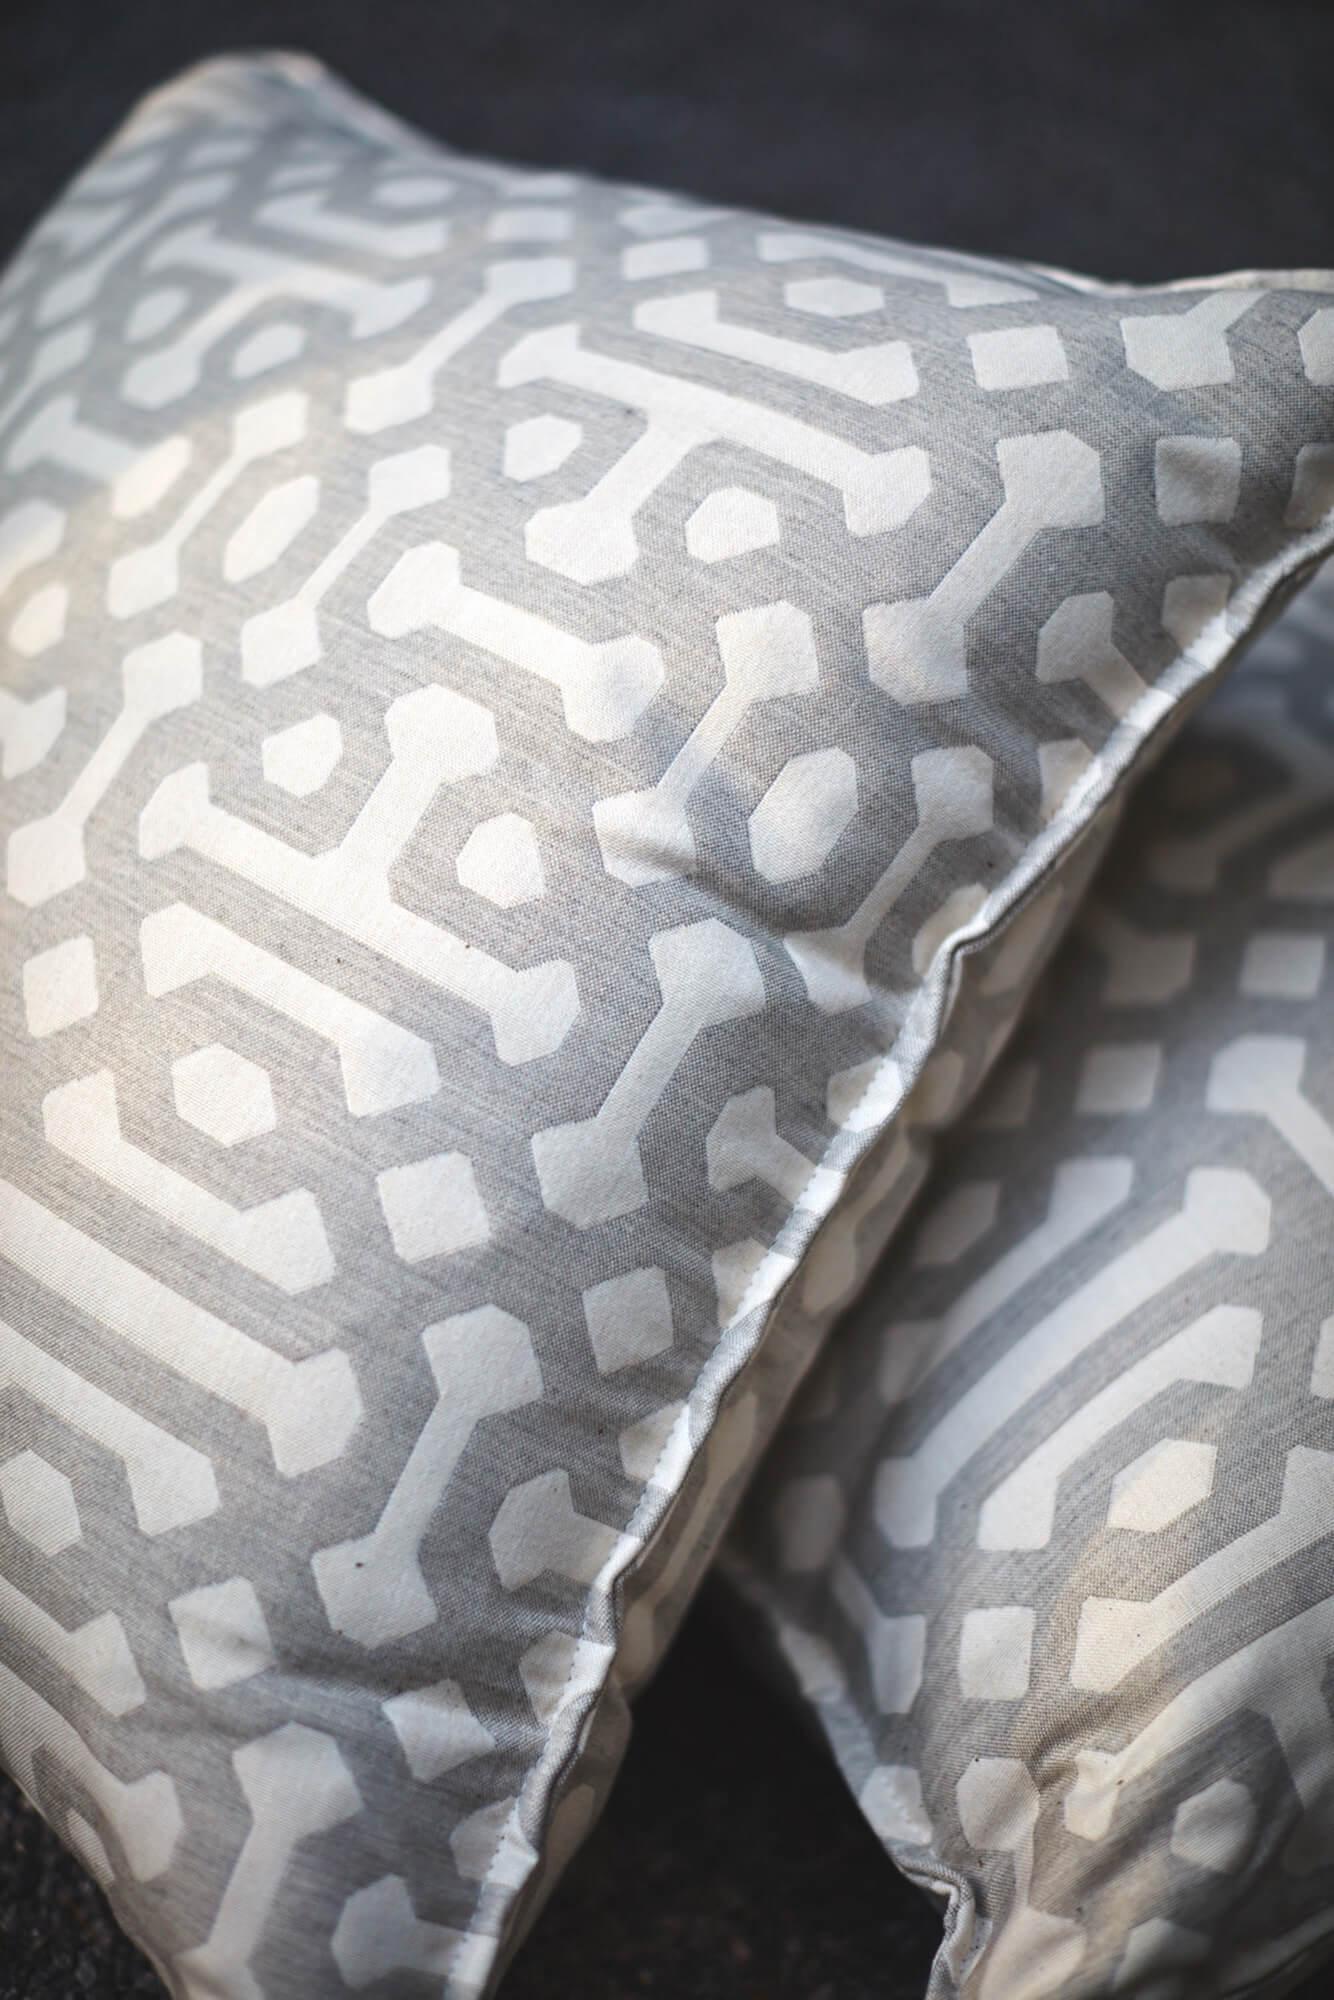 Hai chiếc gối làm bằng vải bọc nệm ghế Sunbrella Fretwork Pewter